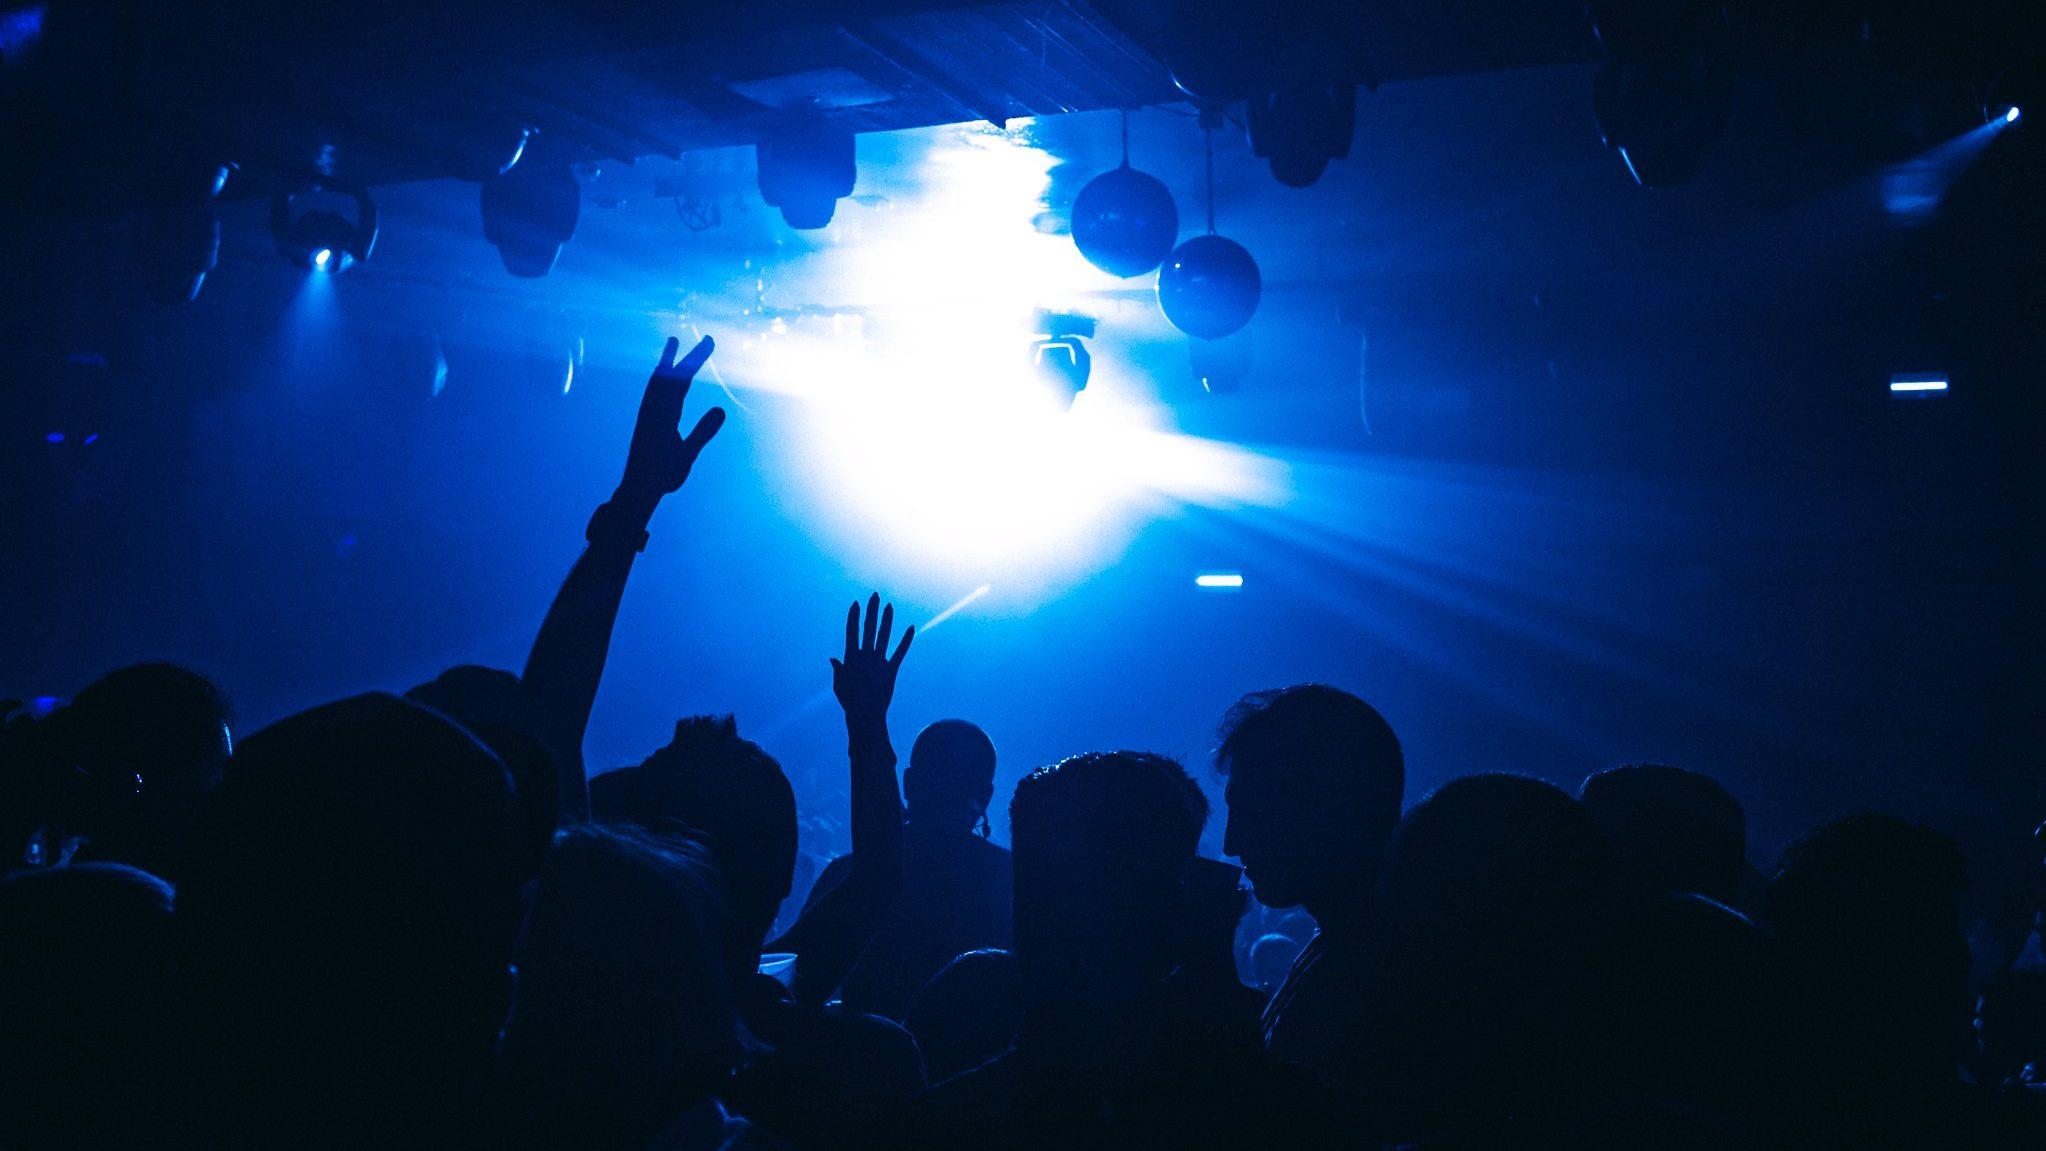 madrid truemusic spain show march 9th party 131 aspect ratio 16 9